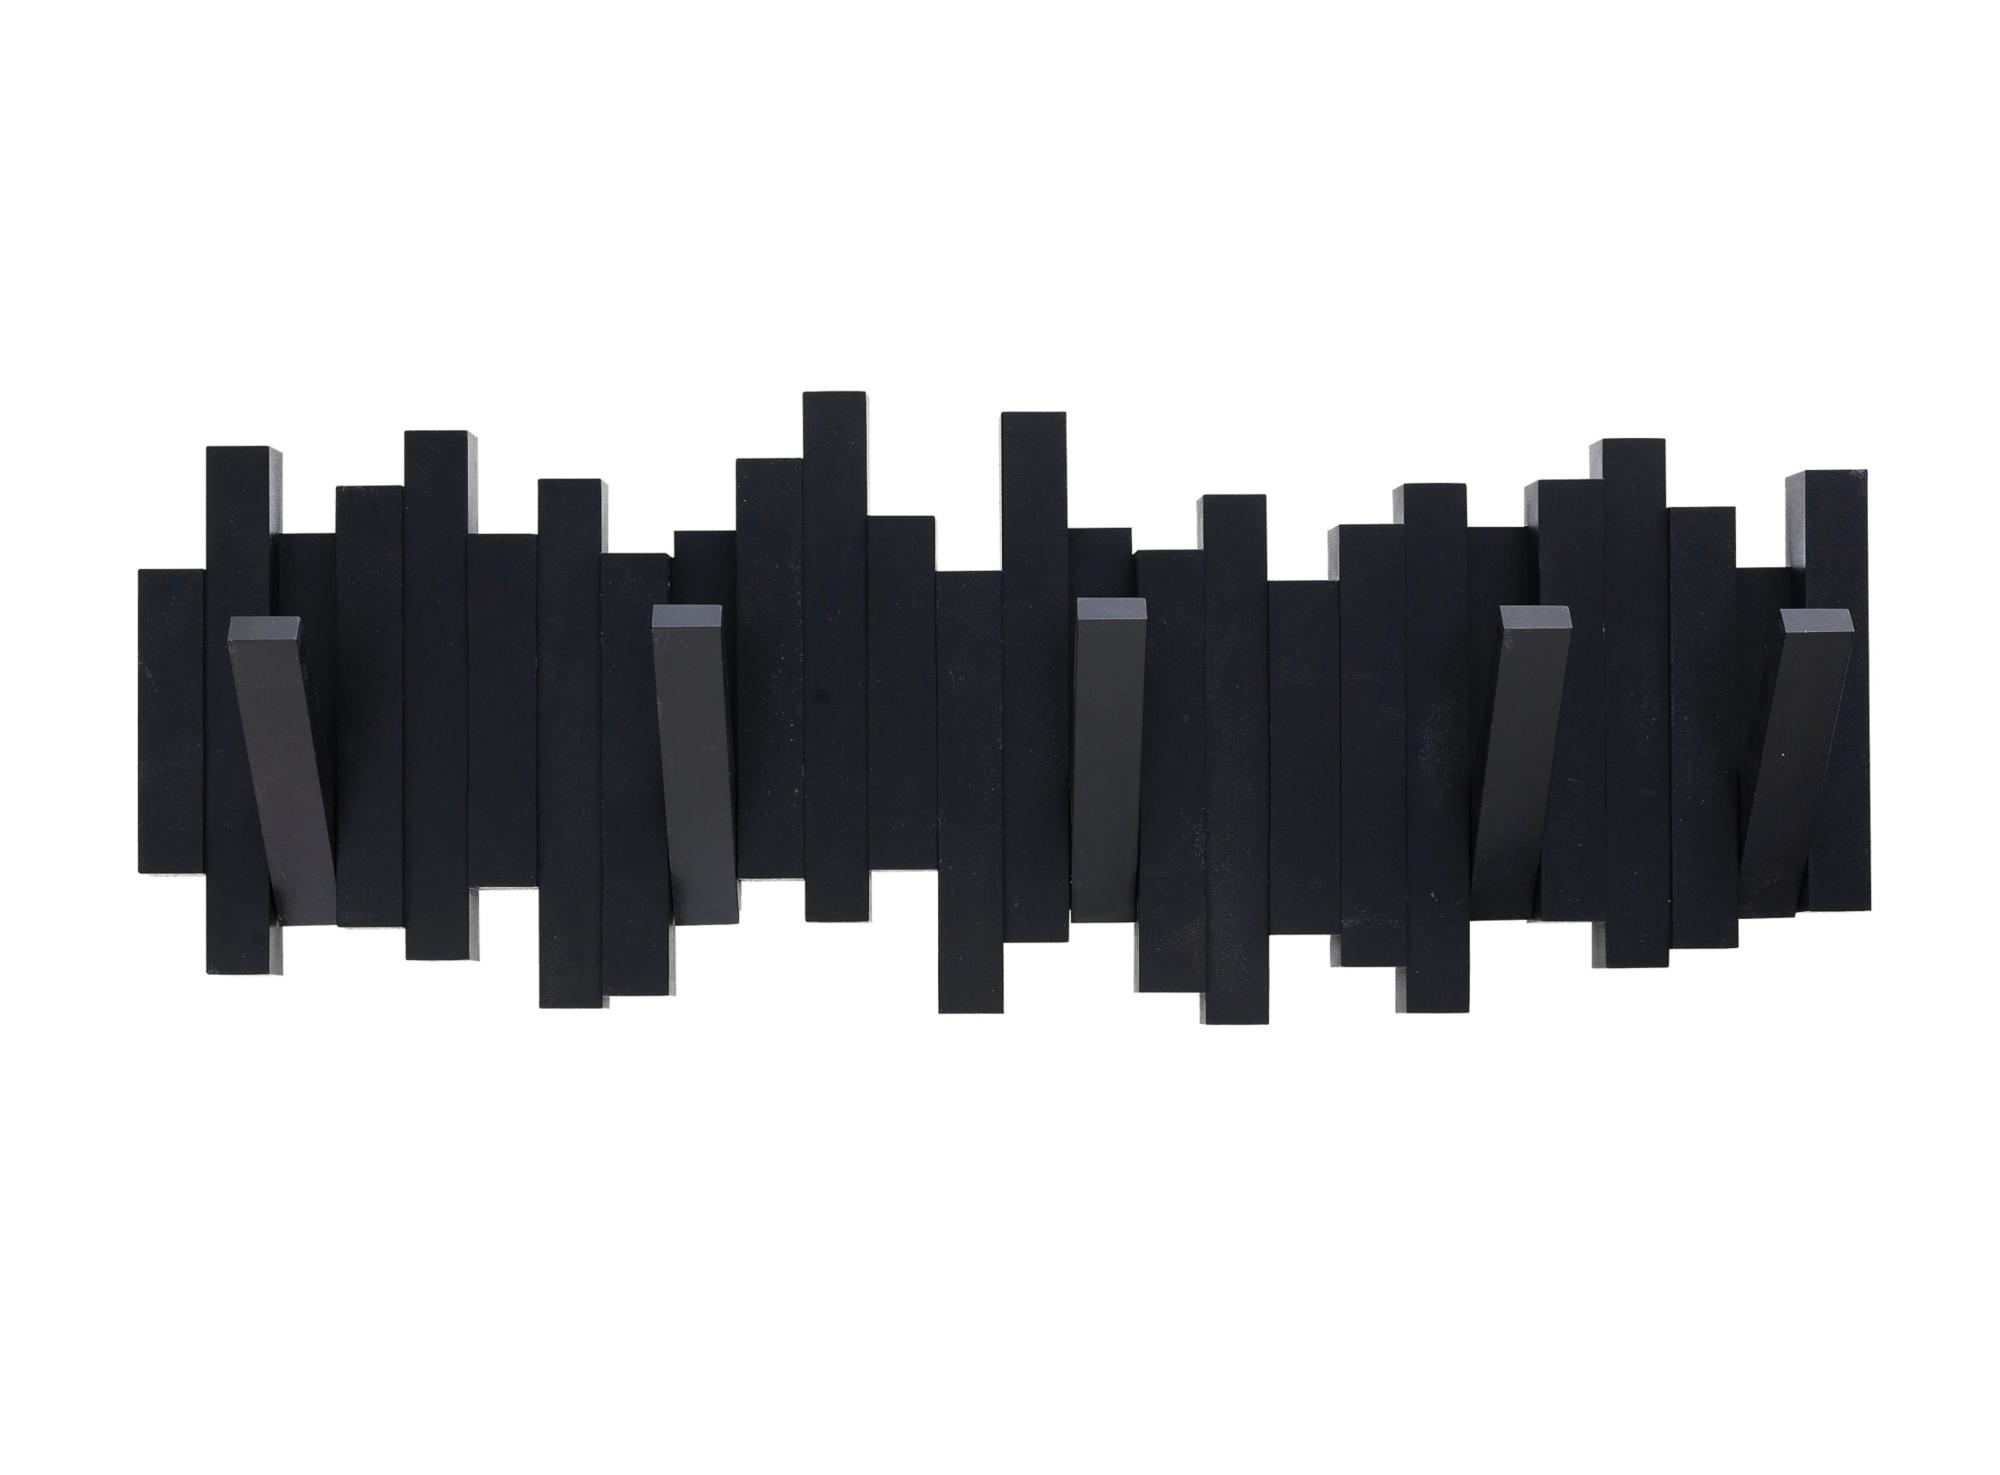 patere murale 5 crochets noir fly. Black Bedroom Furniture Sets. Home Design Ideas